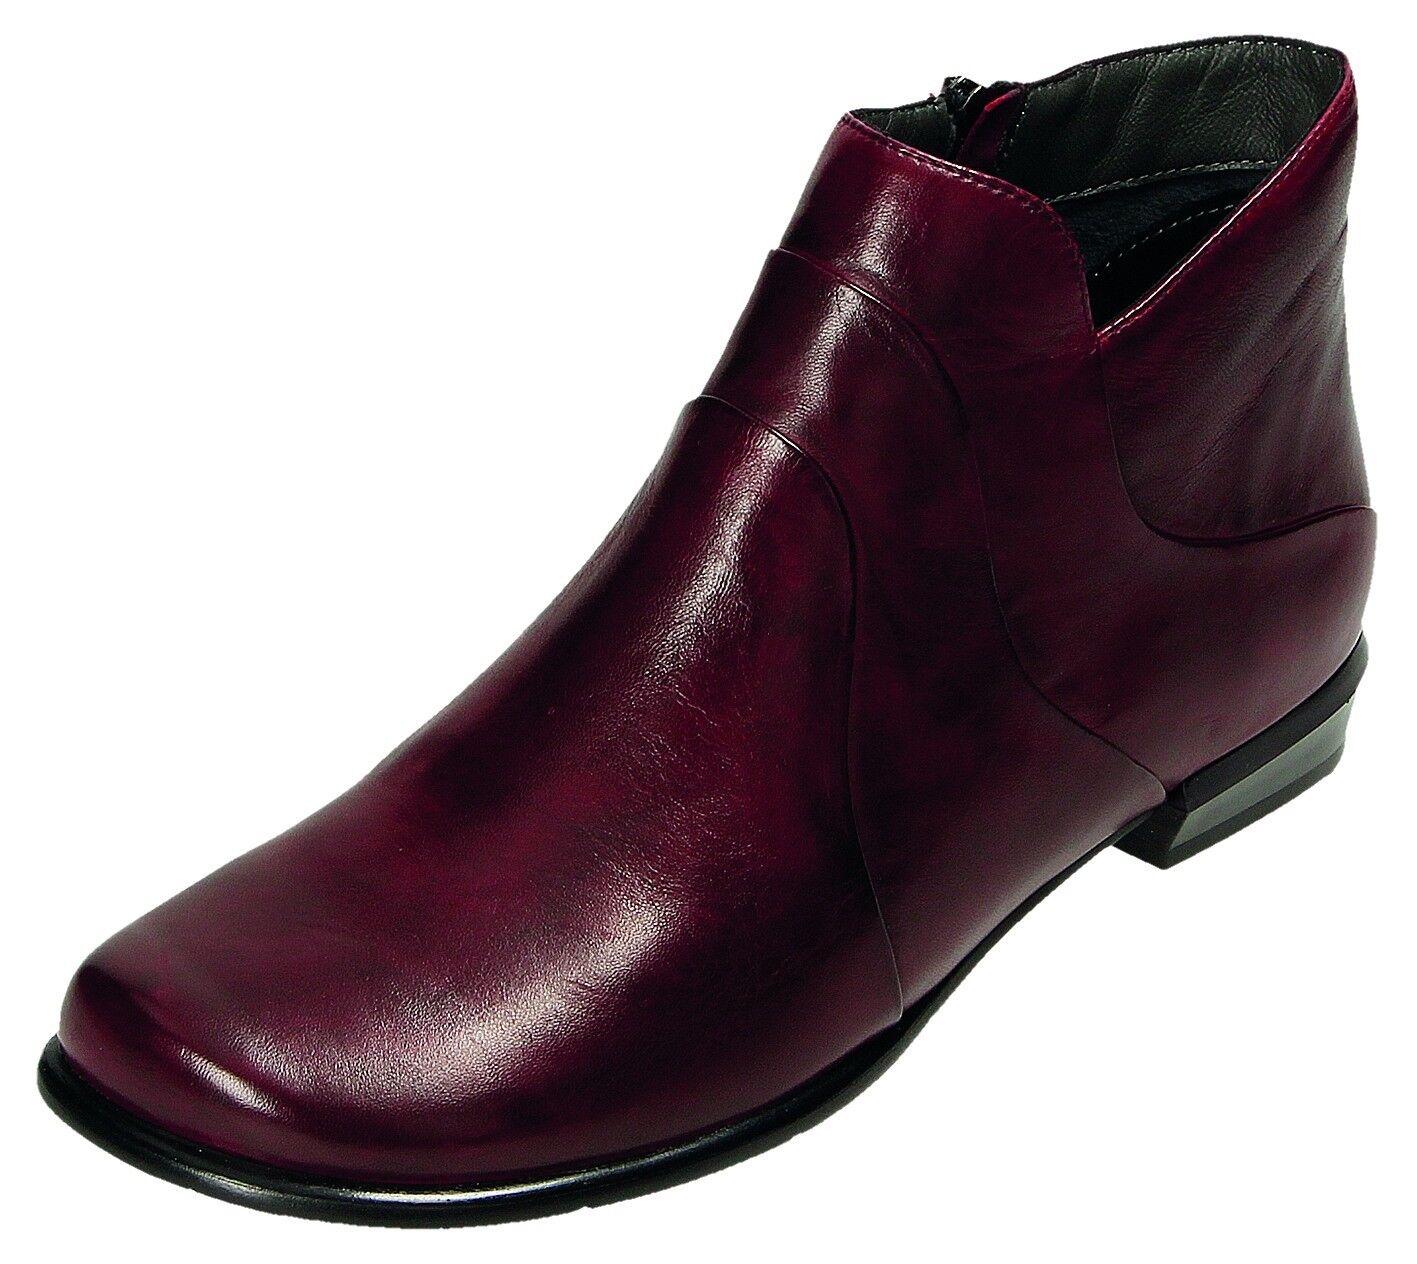 Canal Stiefel/Stiefelette Grande Damen Stiefel/Stiefelette Canal Damen RV-Stiefel Rot 81611F2298-03 491b4d